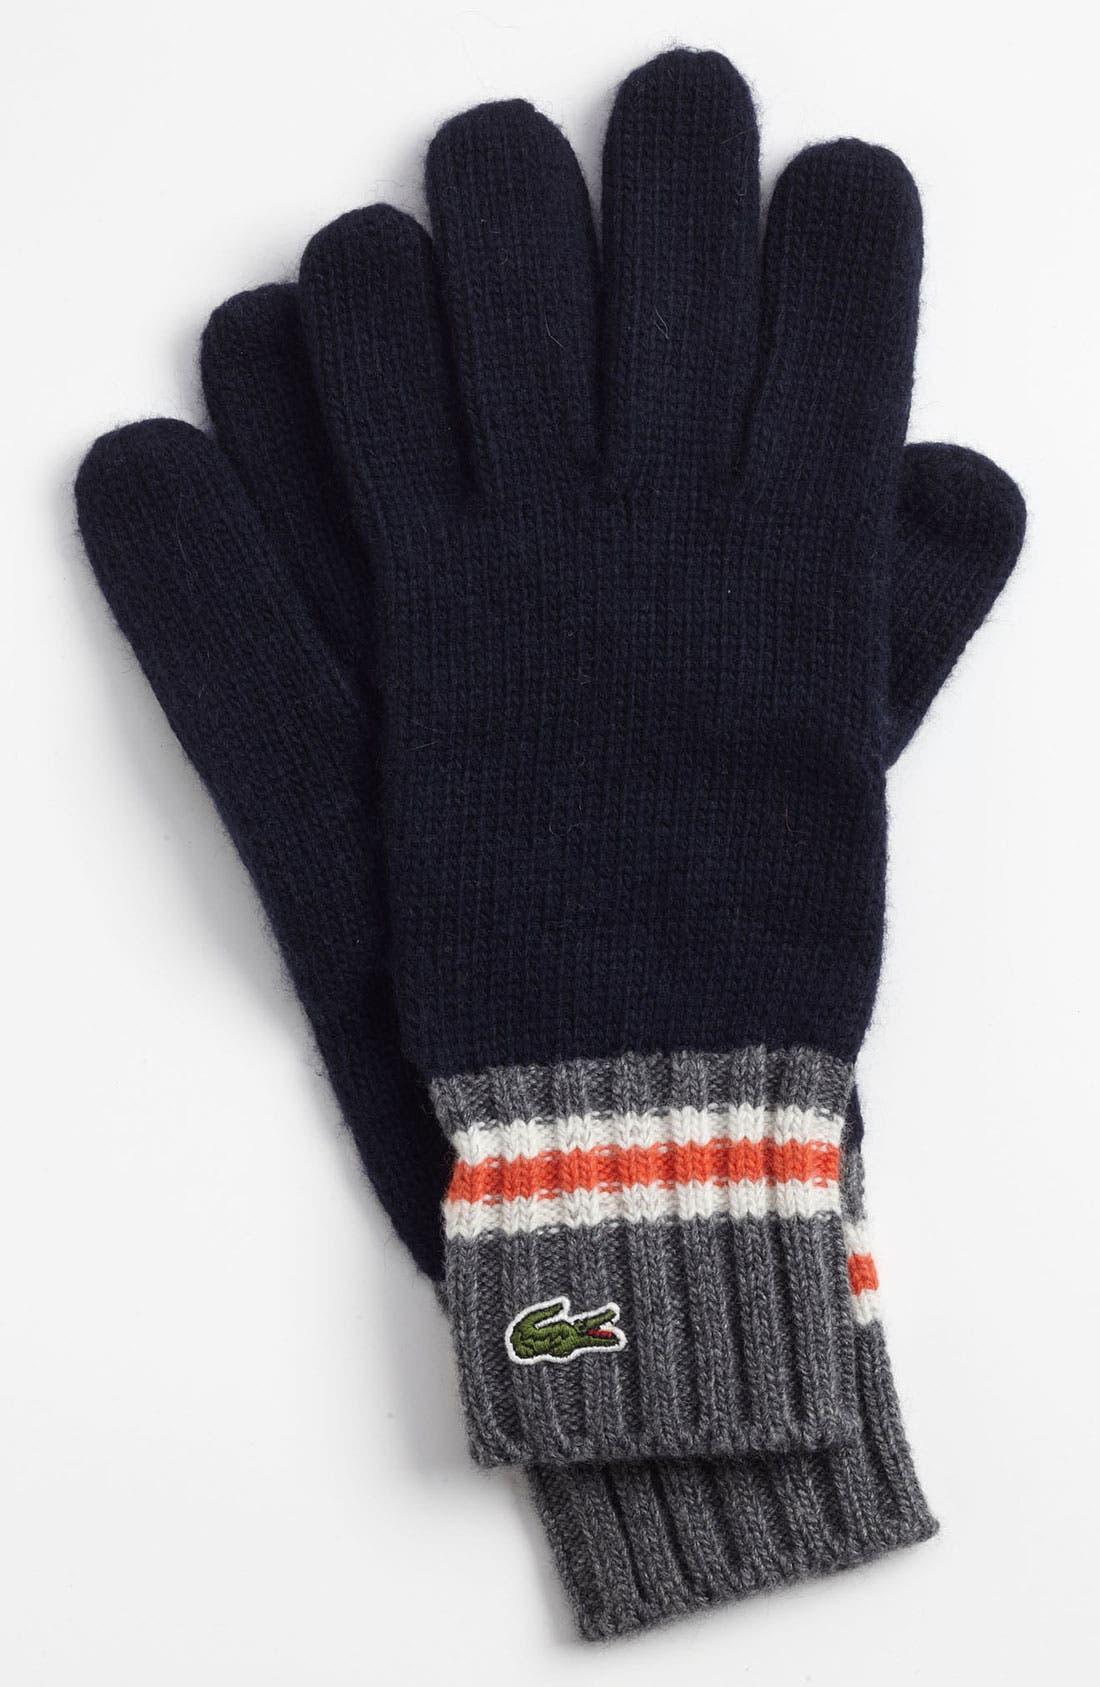 Main Image - Lacoste 'Toboggan' Knit Gloves